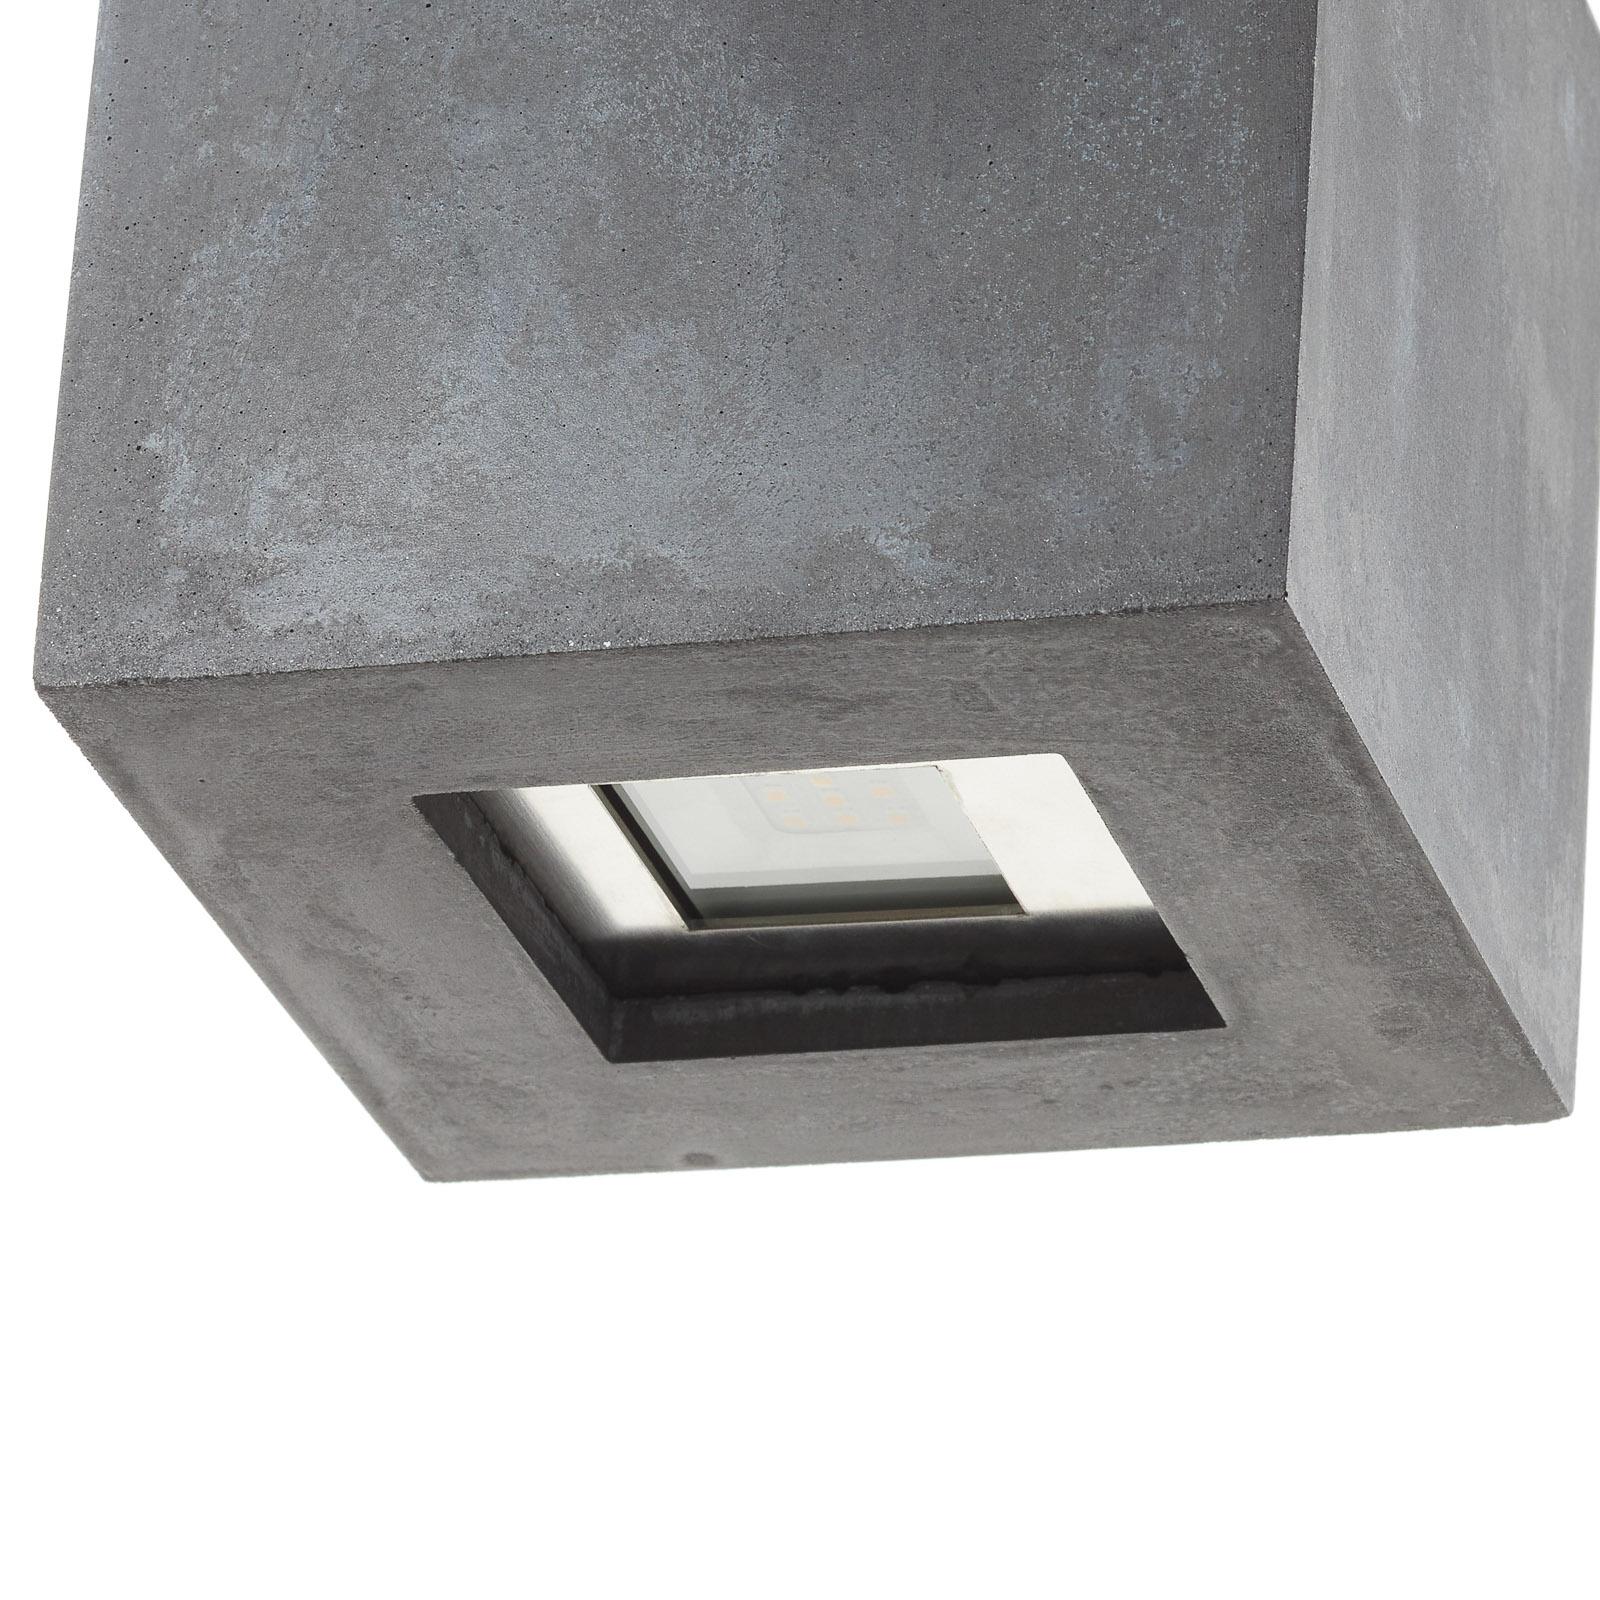 LED-kattovalaisin 1094 ulos, musta